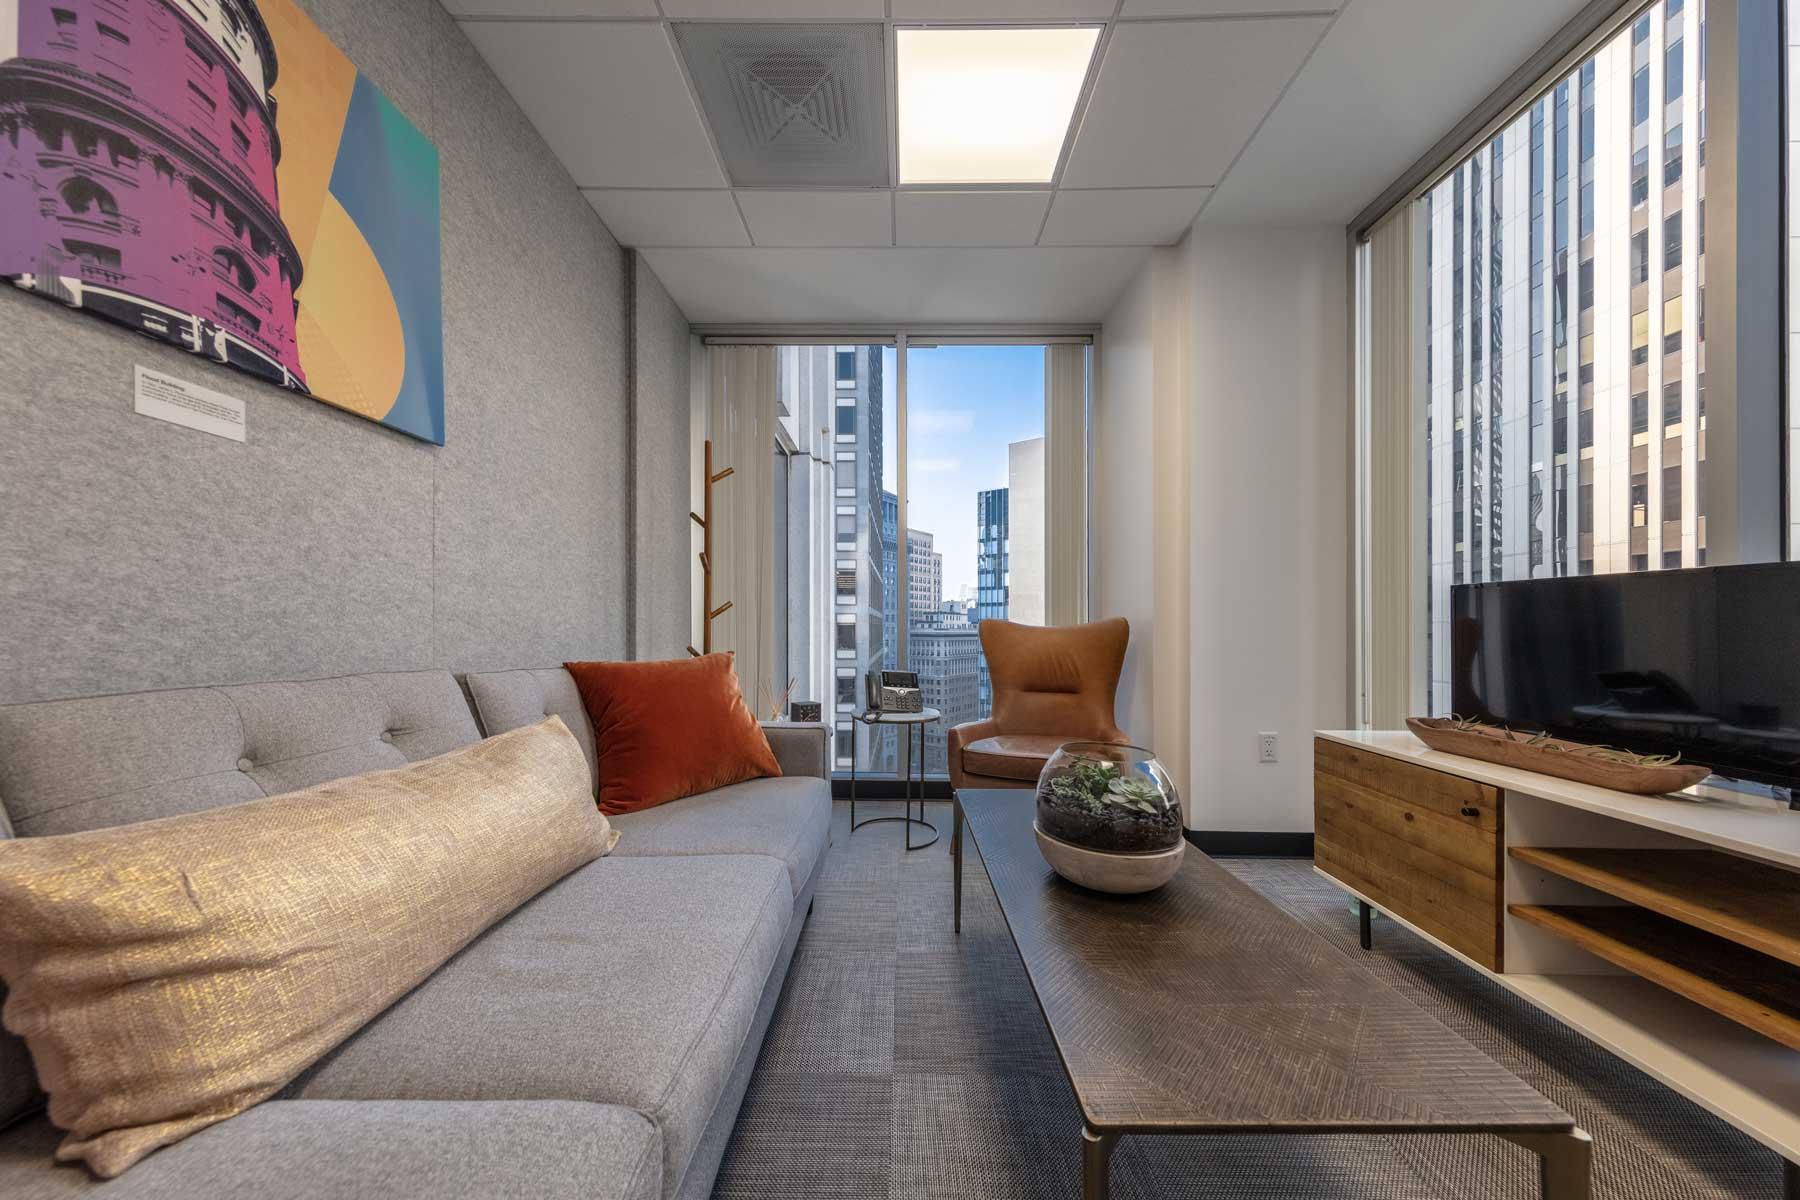 Crossover art and interior